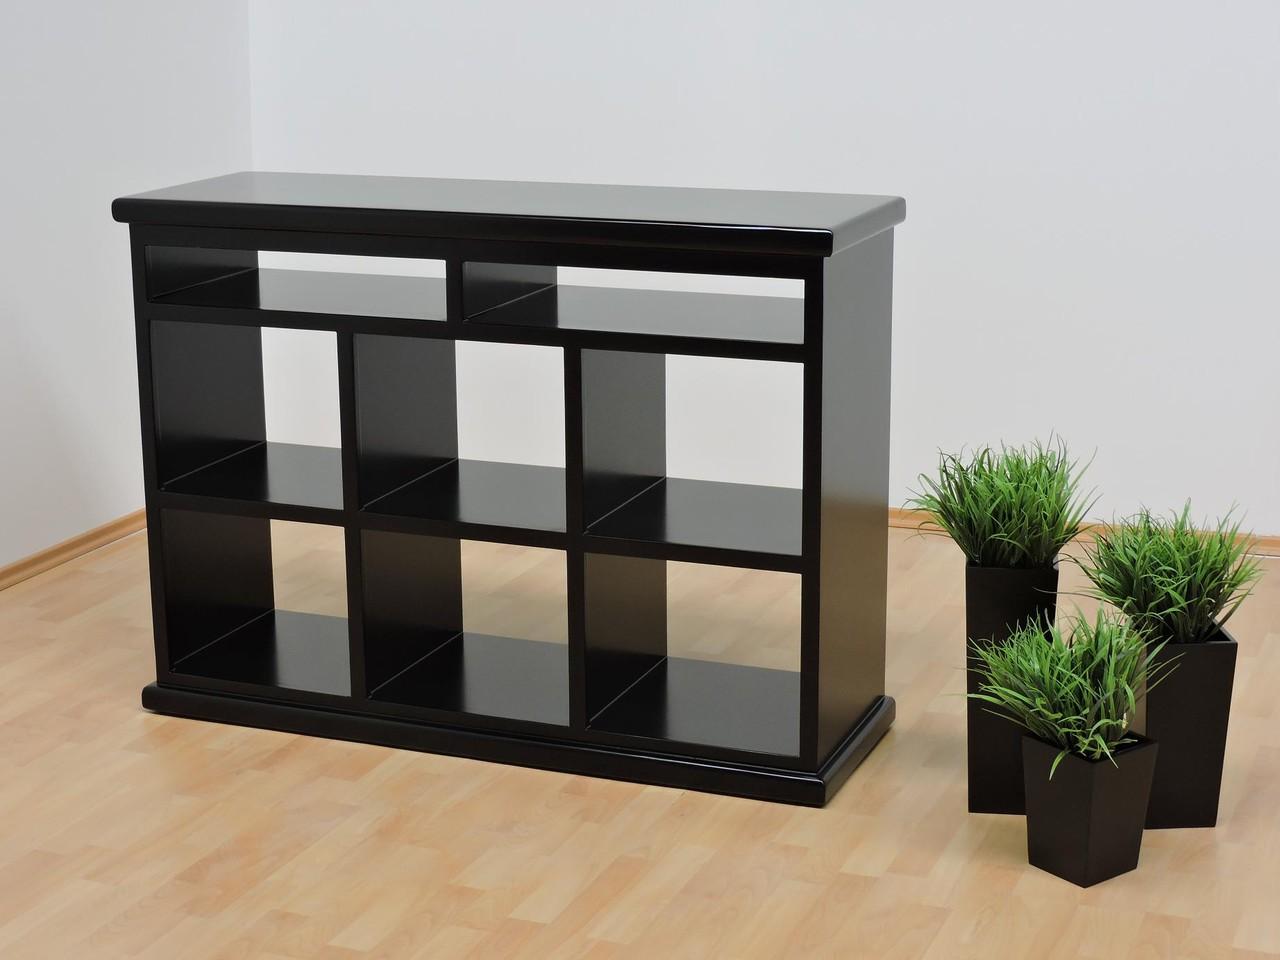 Mesas para television muebles gm muebles de madera for Modelos de muebles para televisor